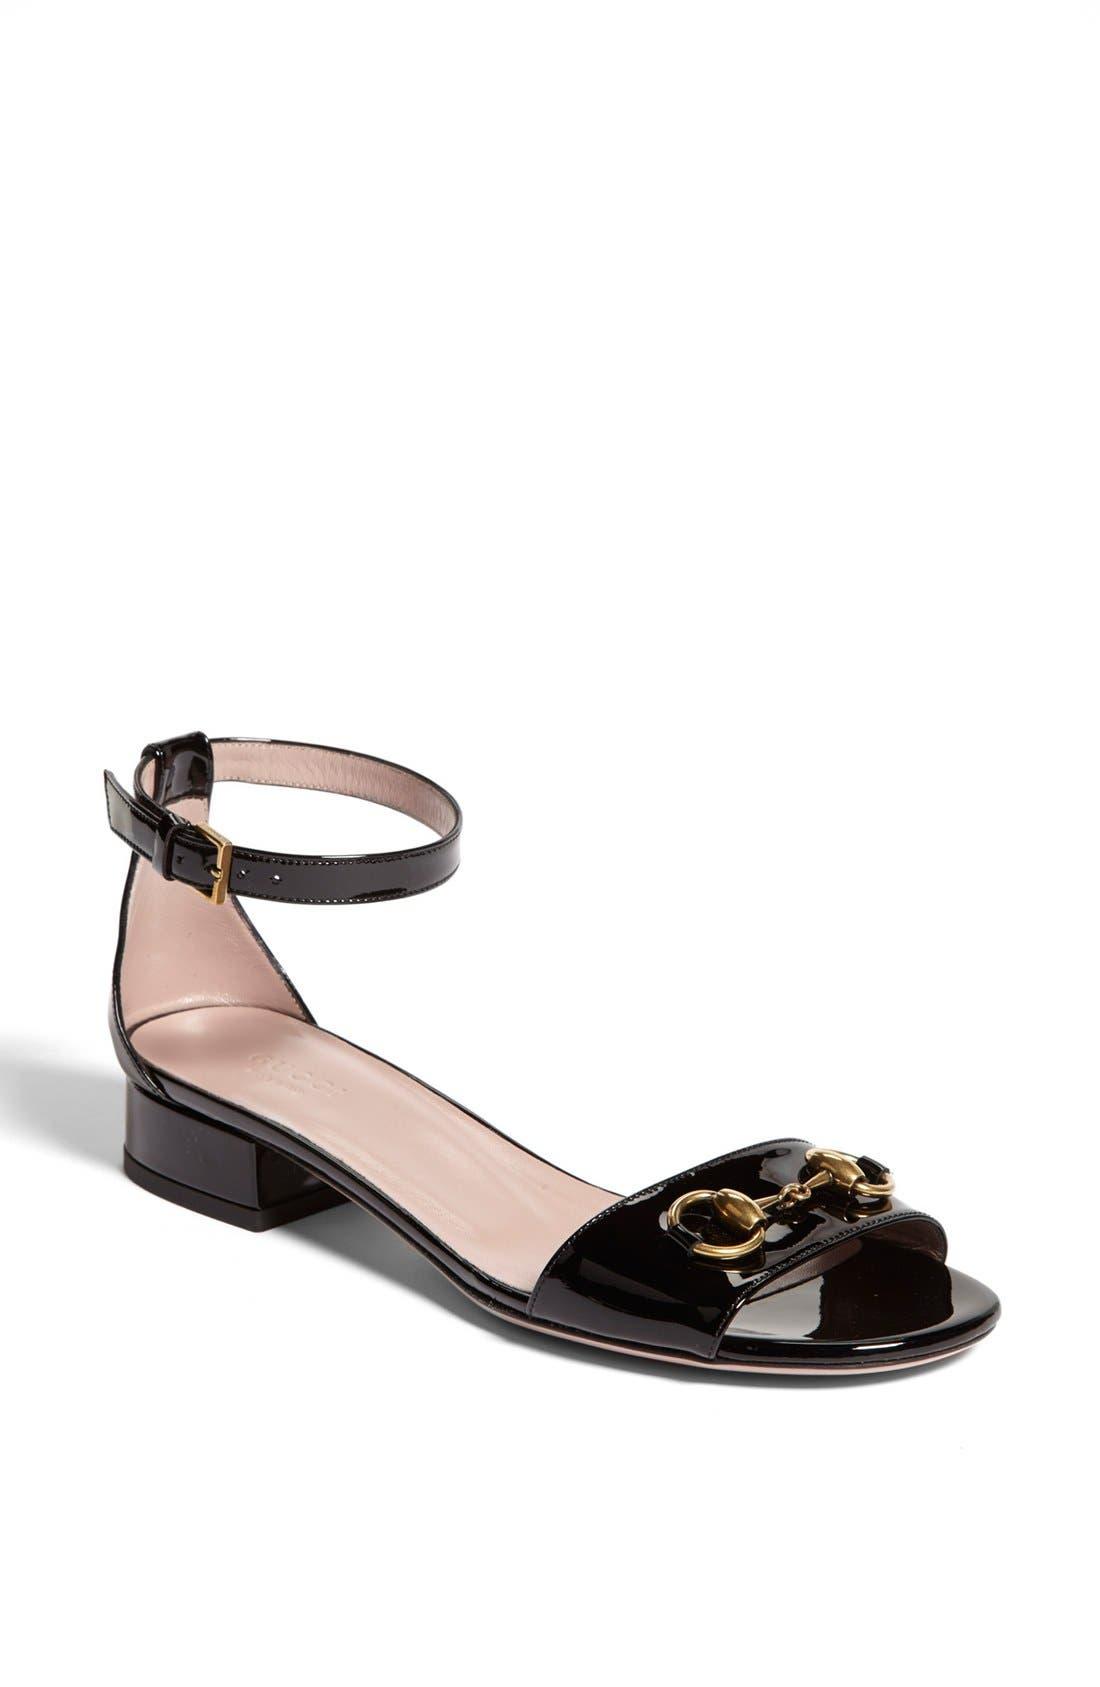 Main Image - Gucci 'Liliane' Ankle Strap Sandal